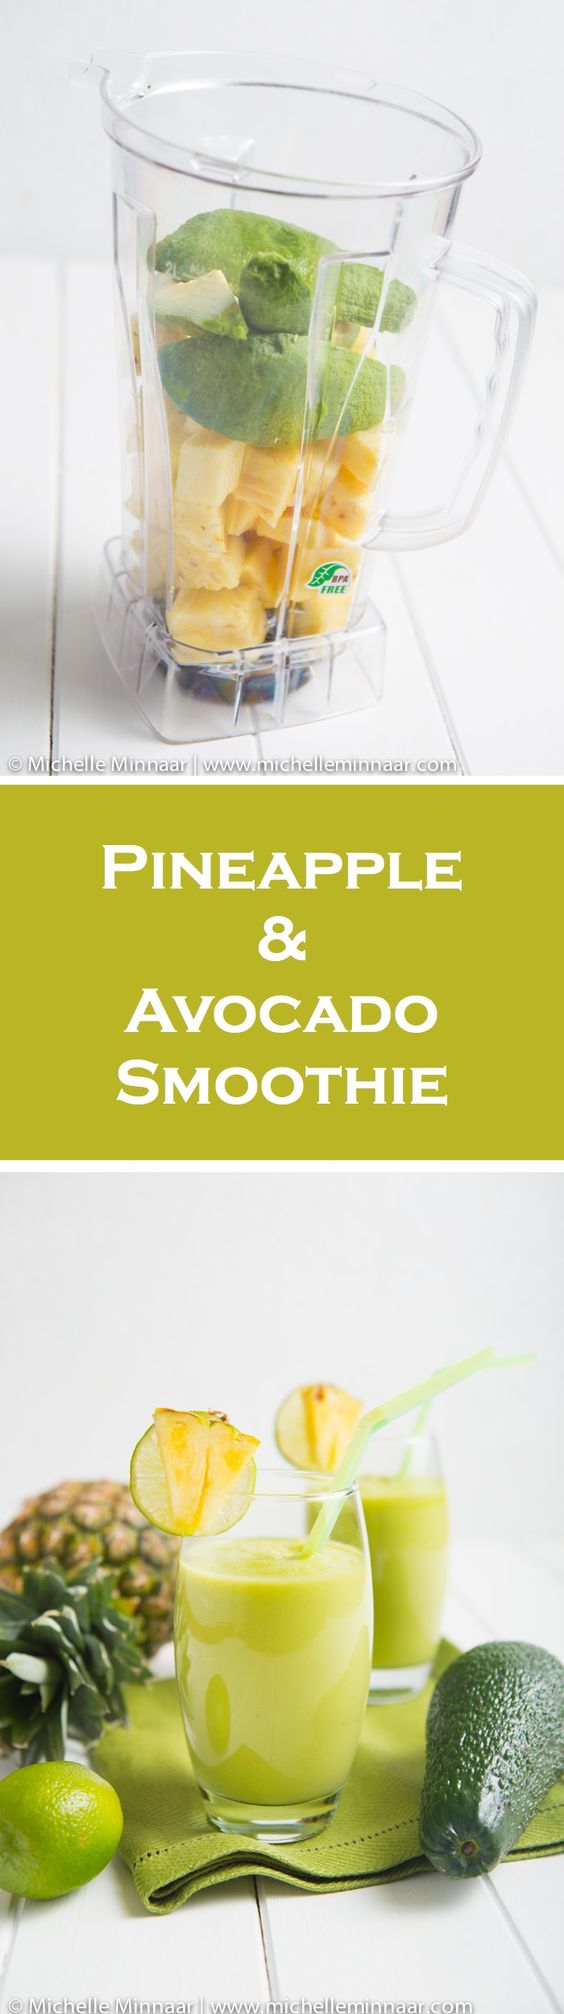 Who Dosent like pineapple and avacado, perfect shake this